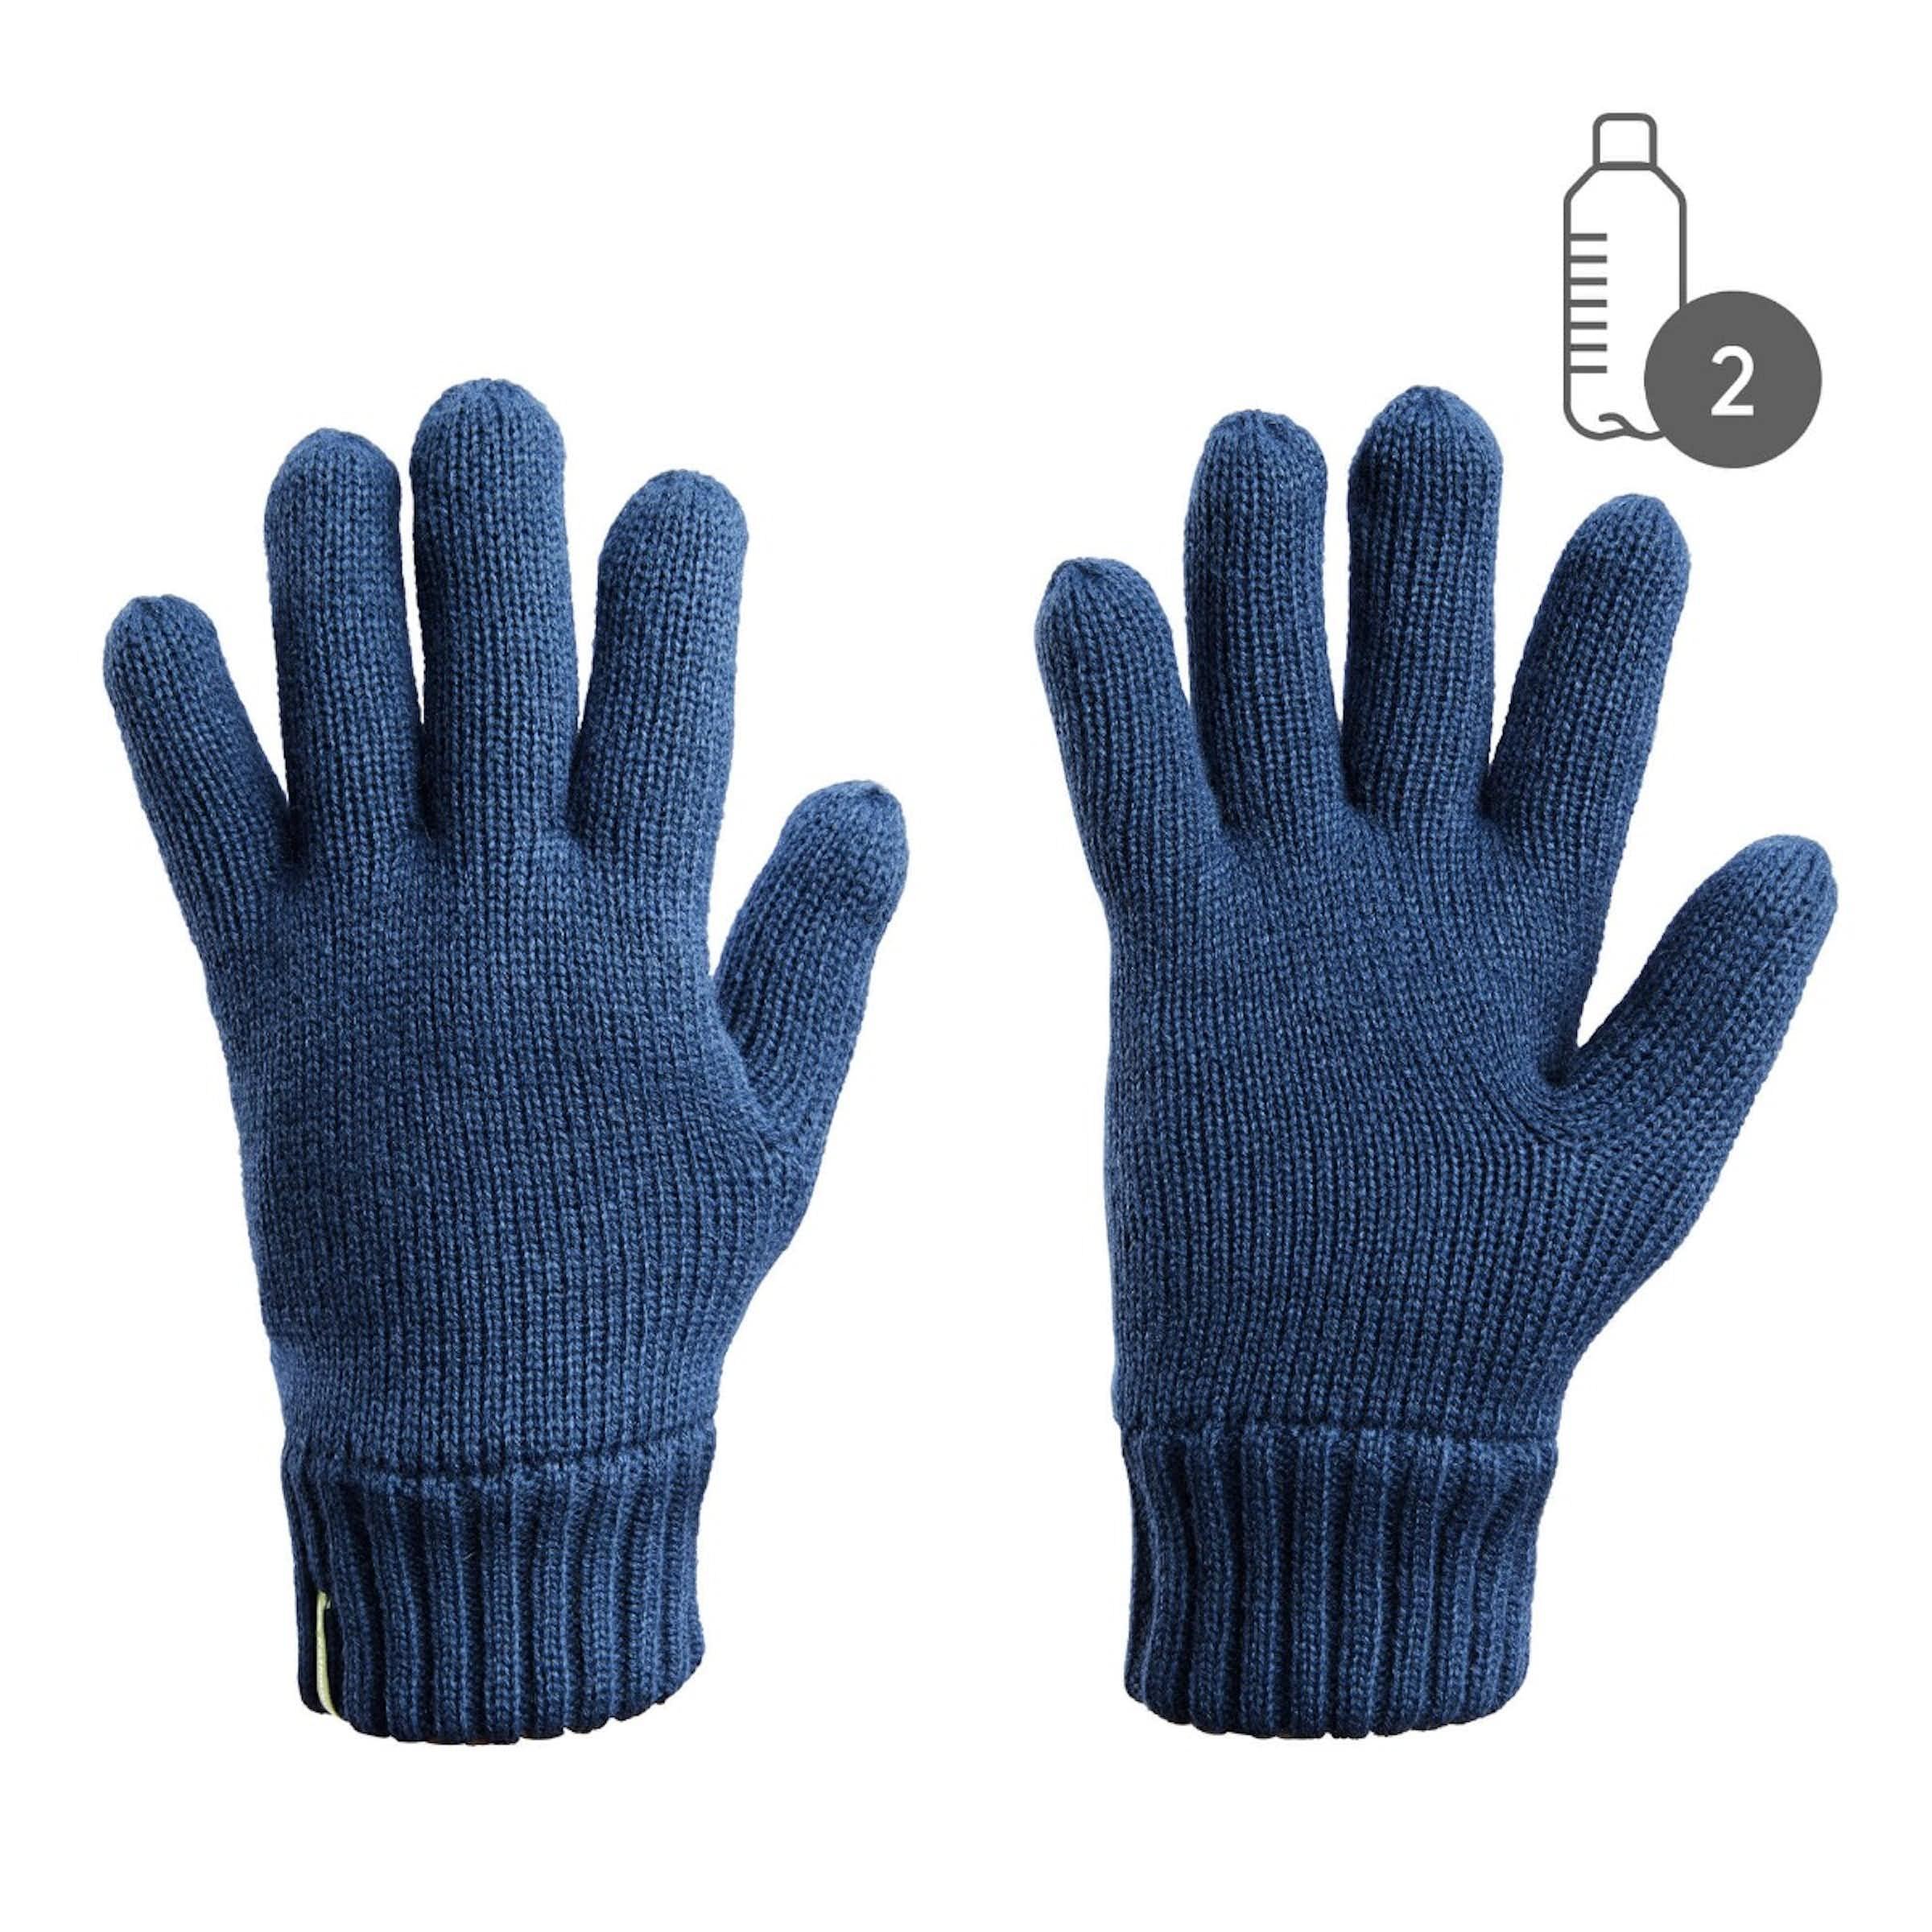 577dad65a Men's Gloves & Mittens | Ski & Snow Gloves for Men Sale | AU